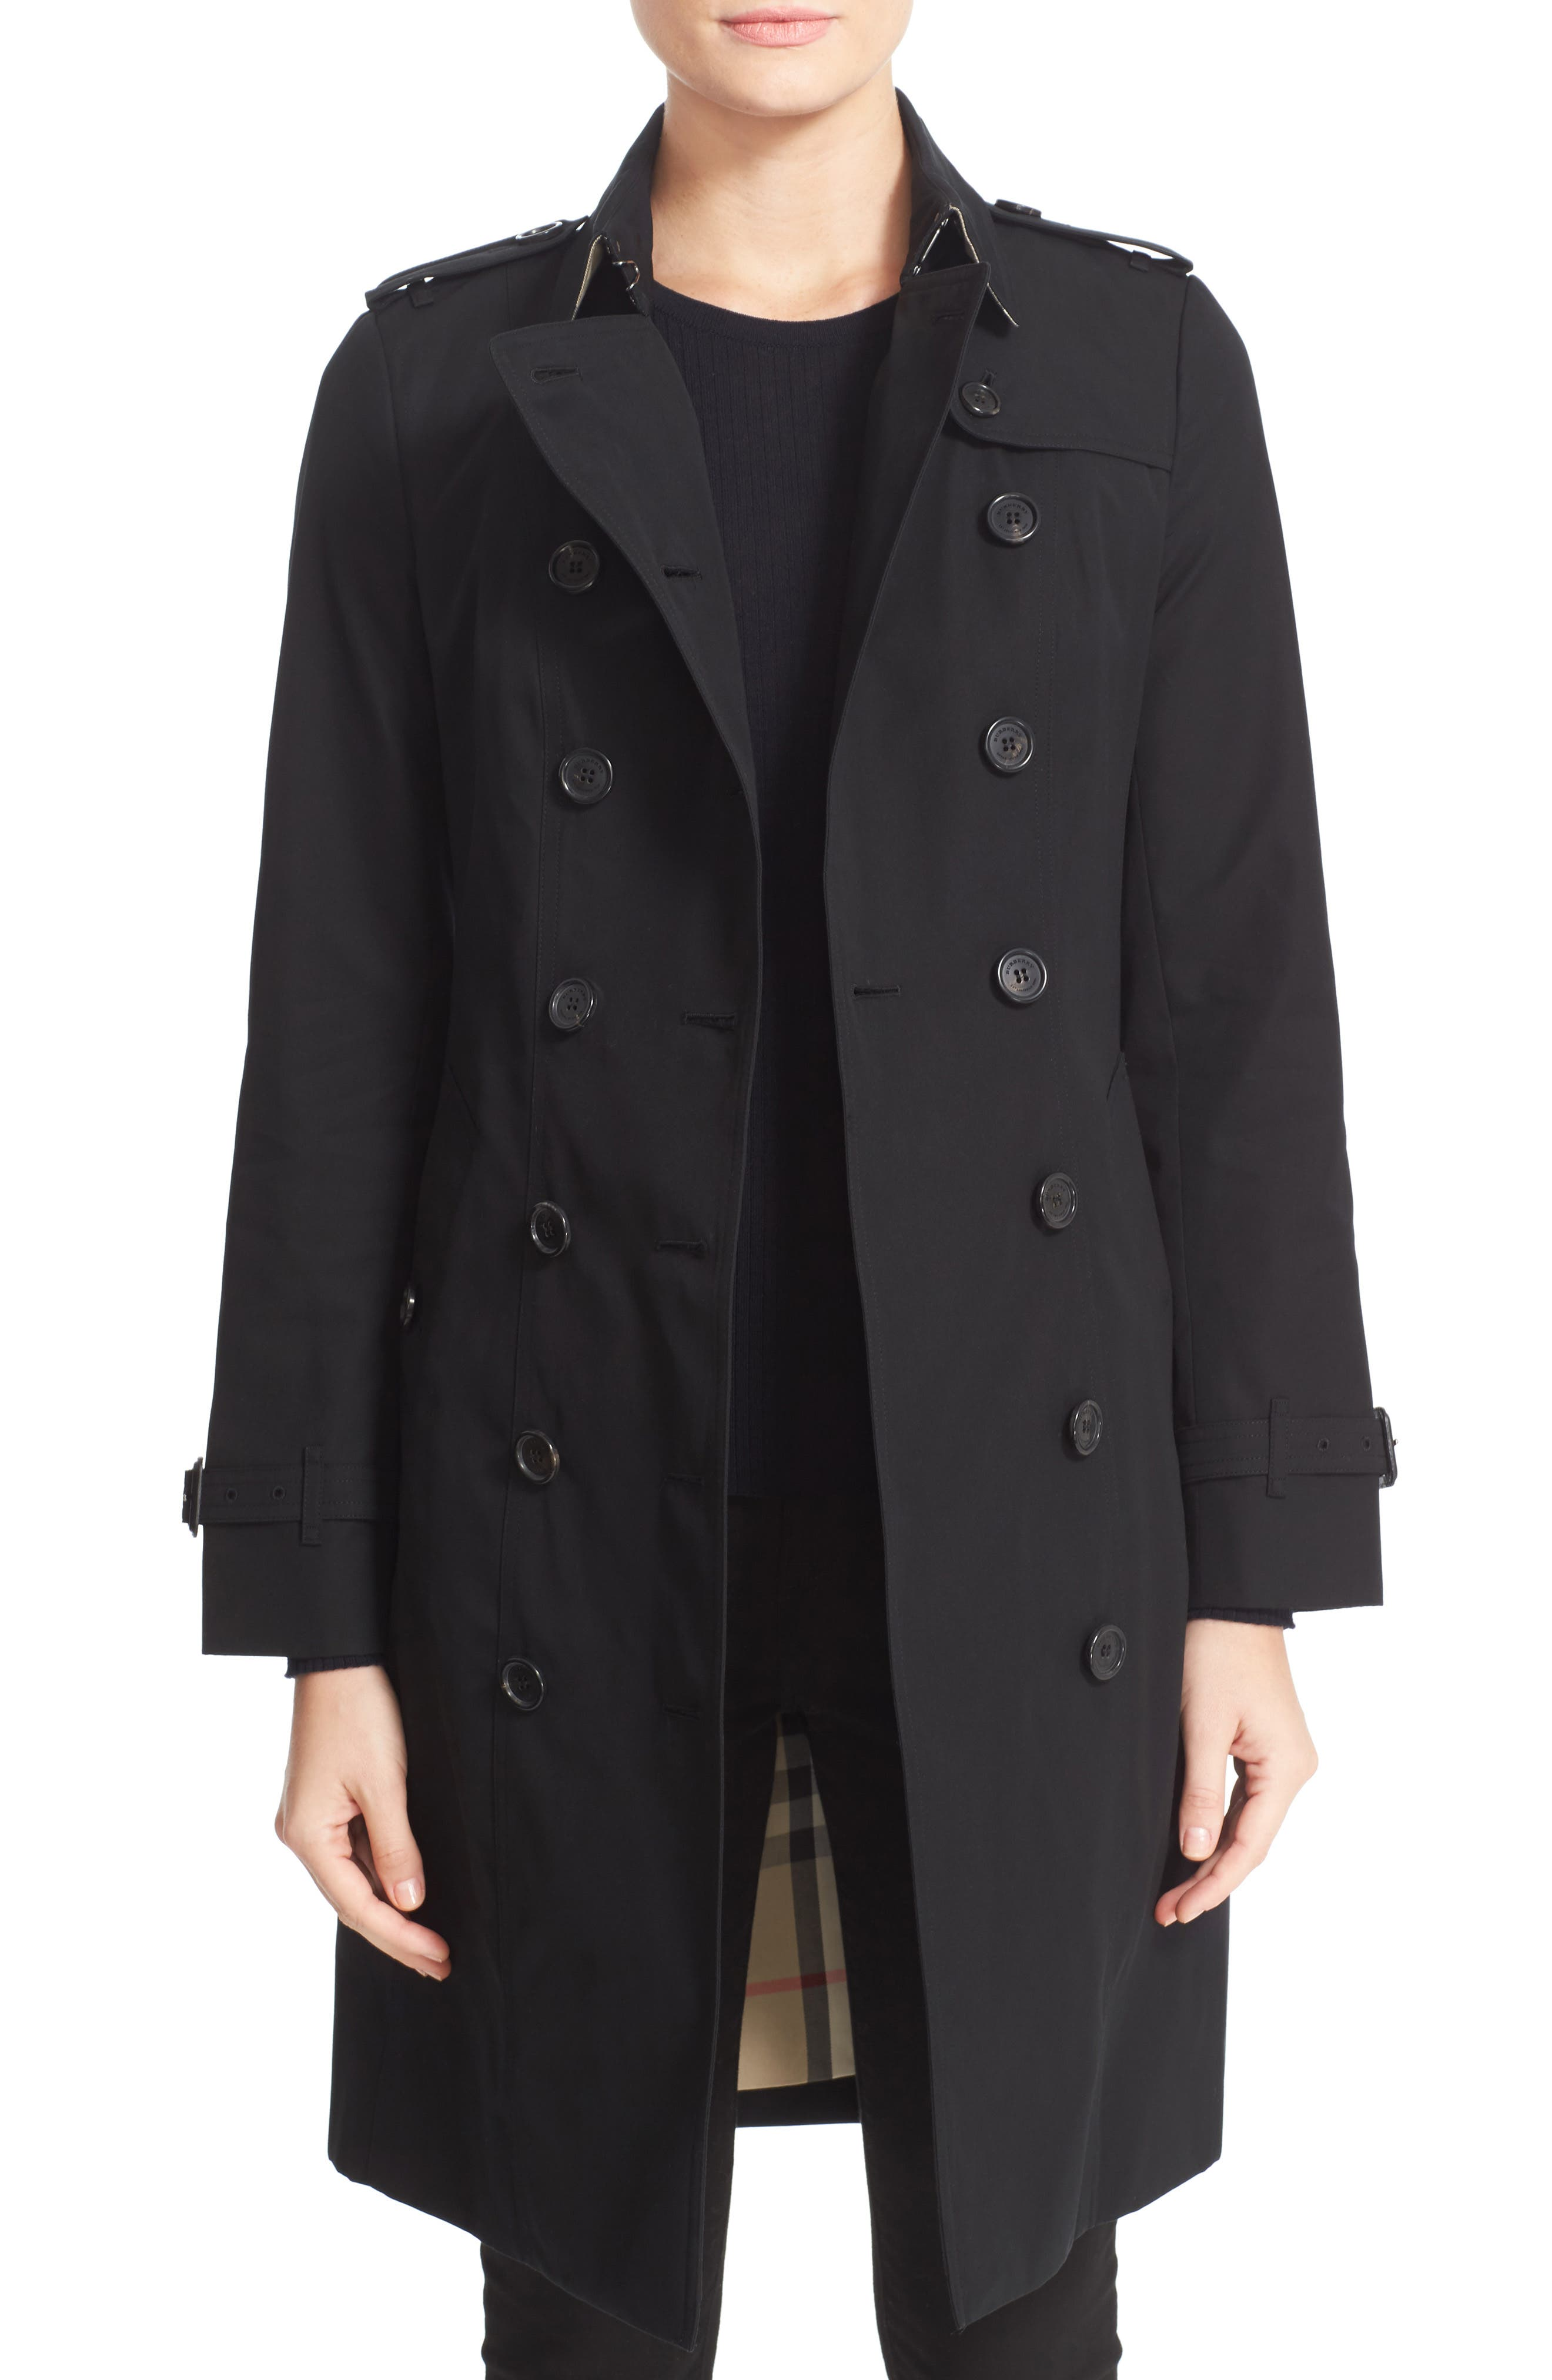 Sandringham Long Slim Trench Coat,                             Main thumbnail 1, color,                             BLACK